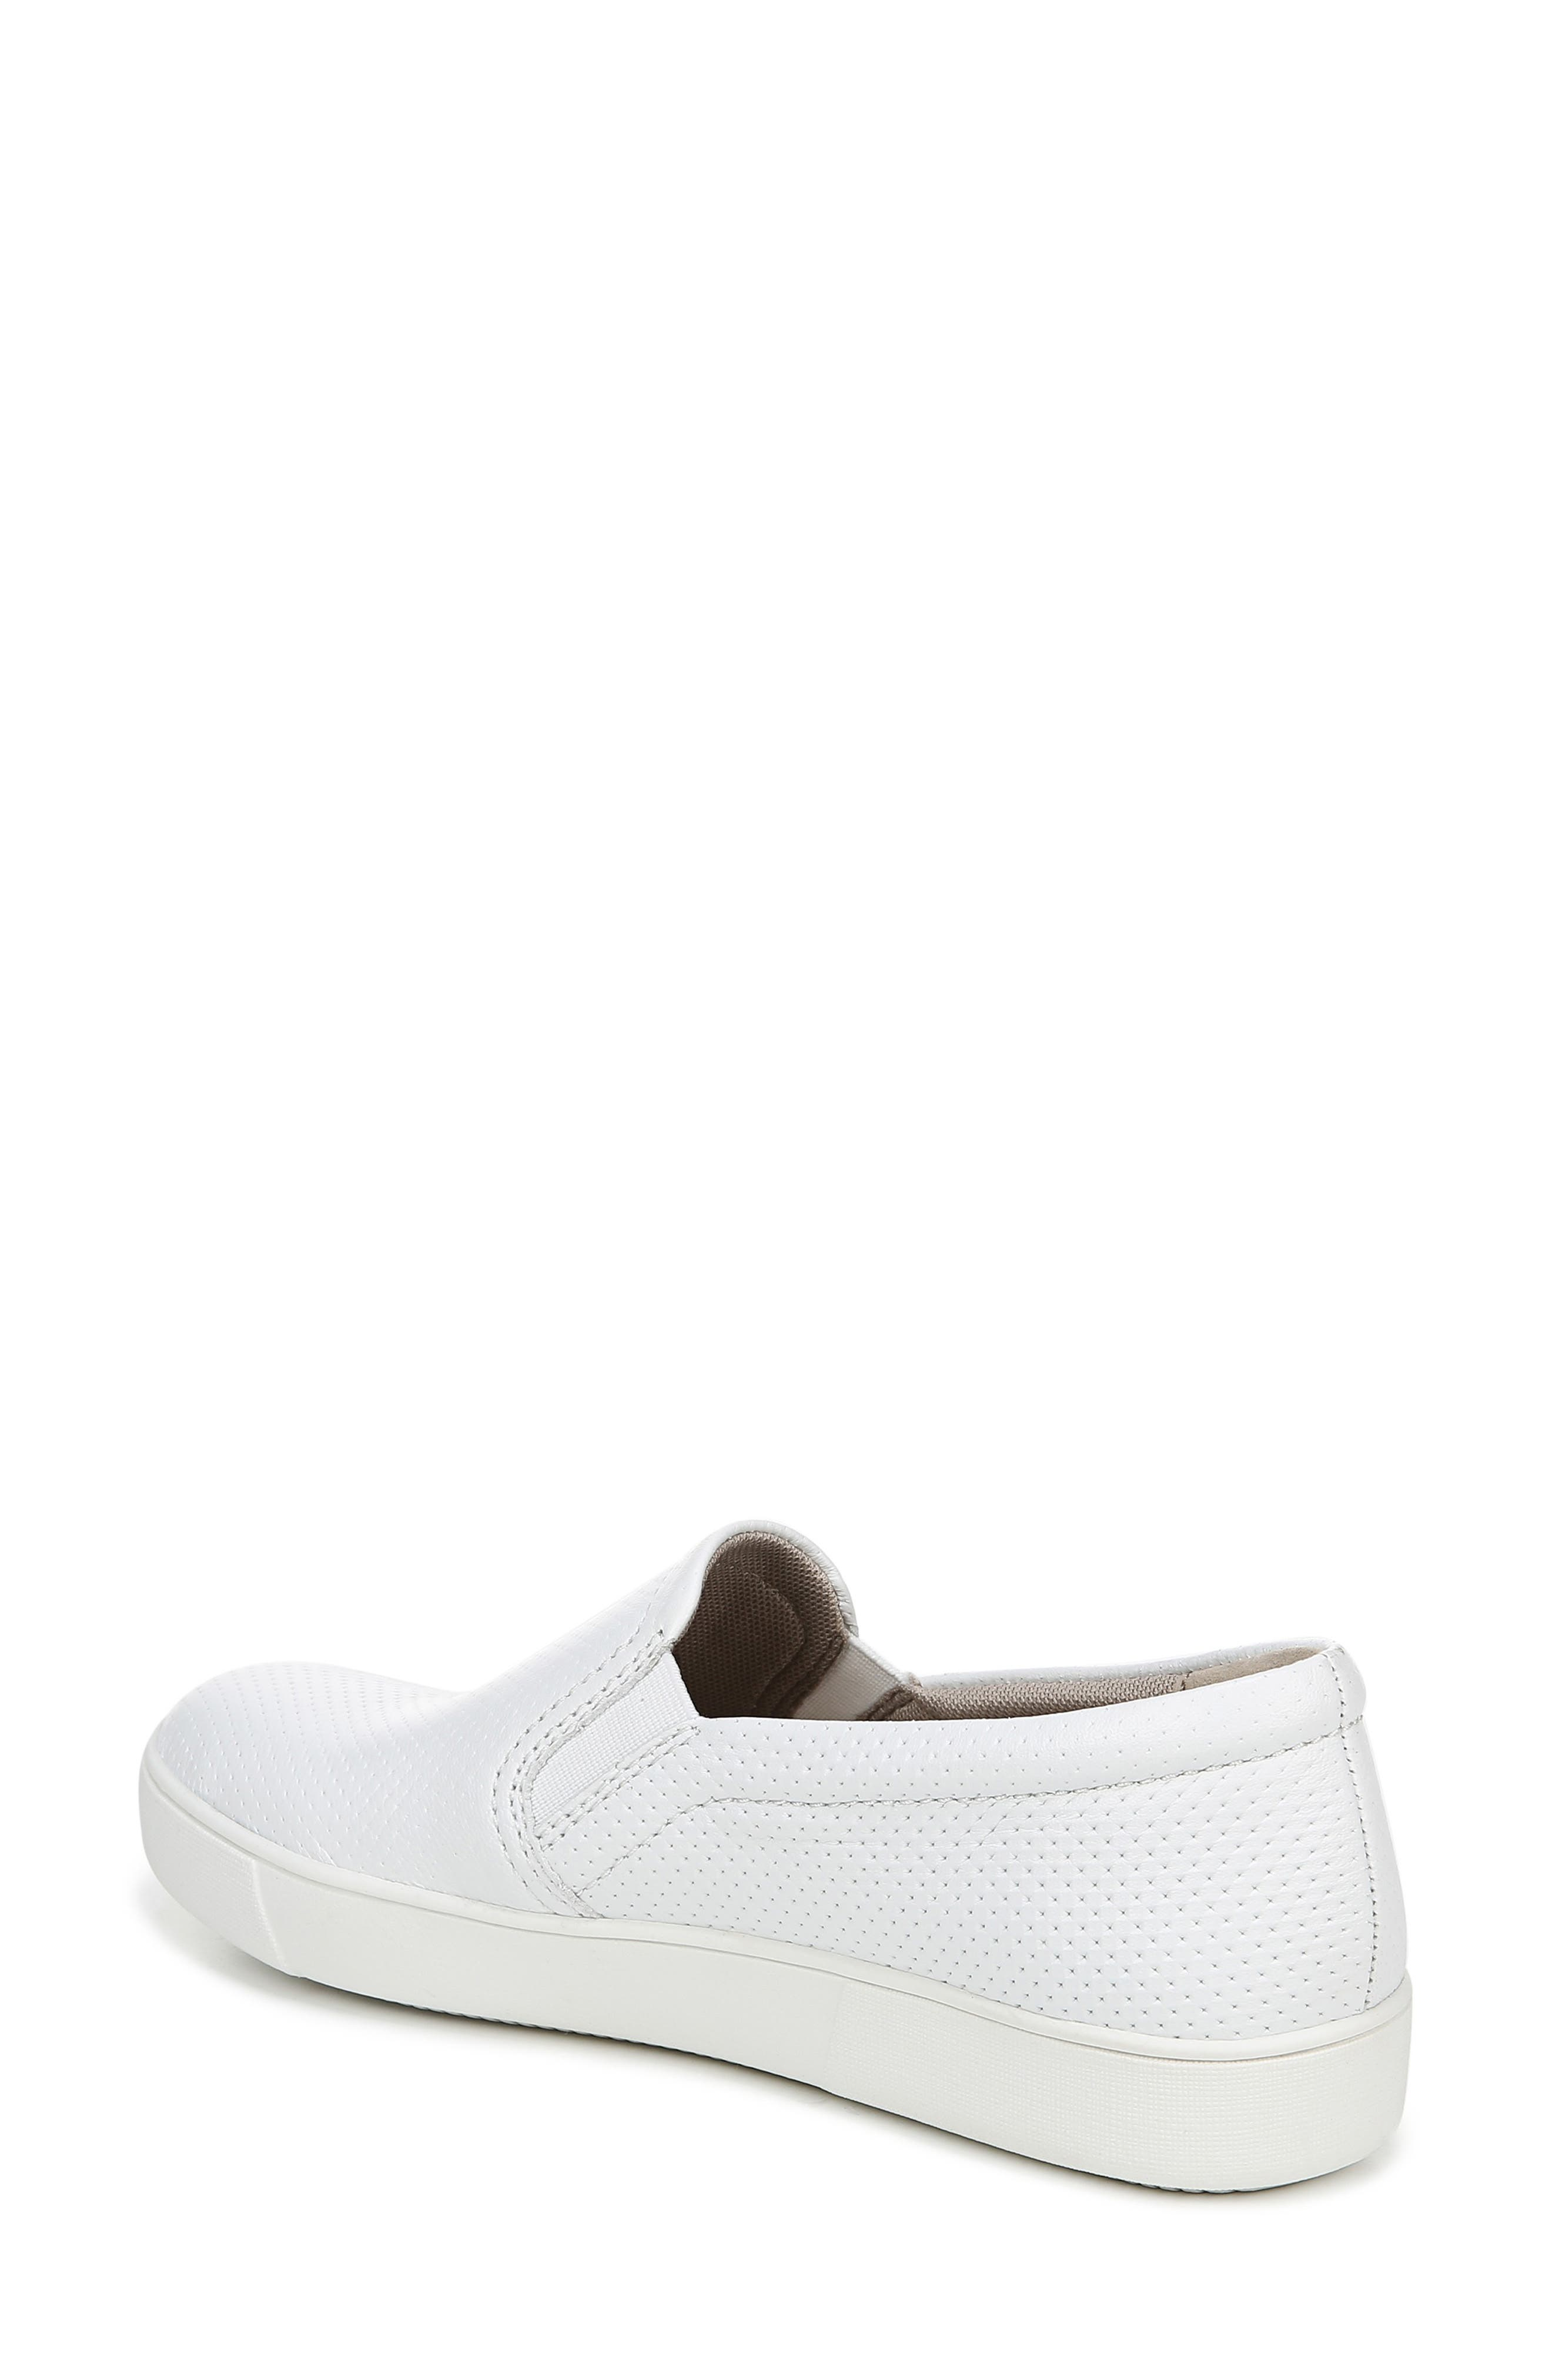 5ac352a3e43a Women s Naturalizer Sneakers   Running Shoes